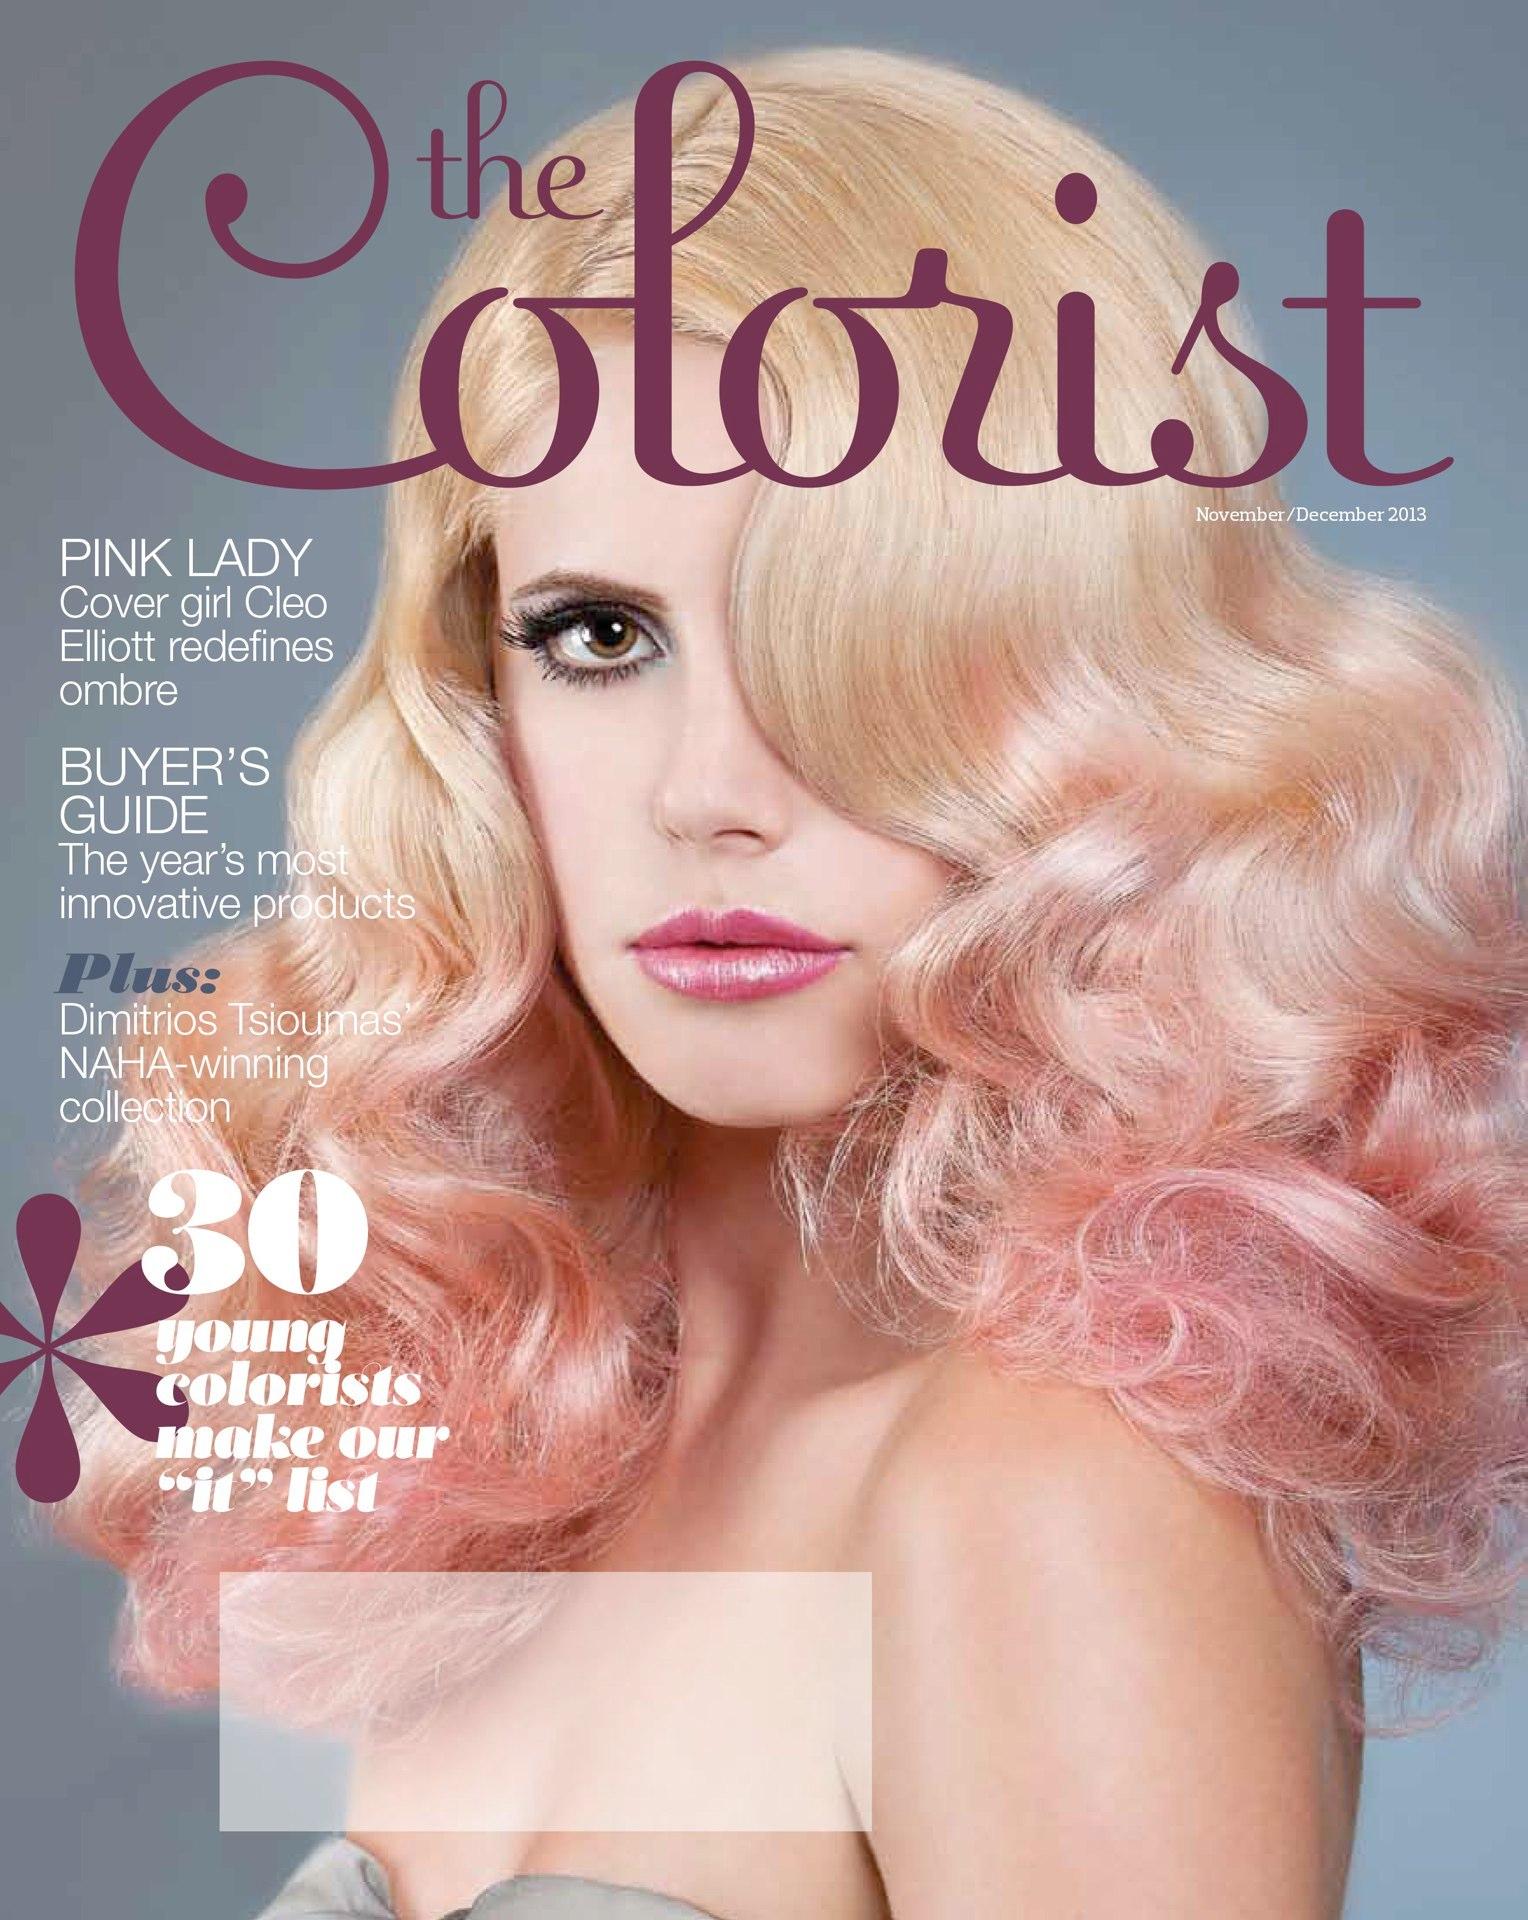 colorist_cover_112013.jpg